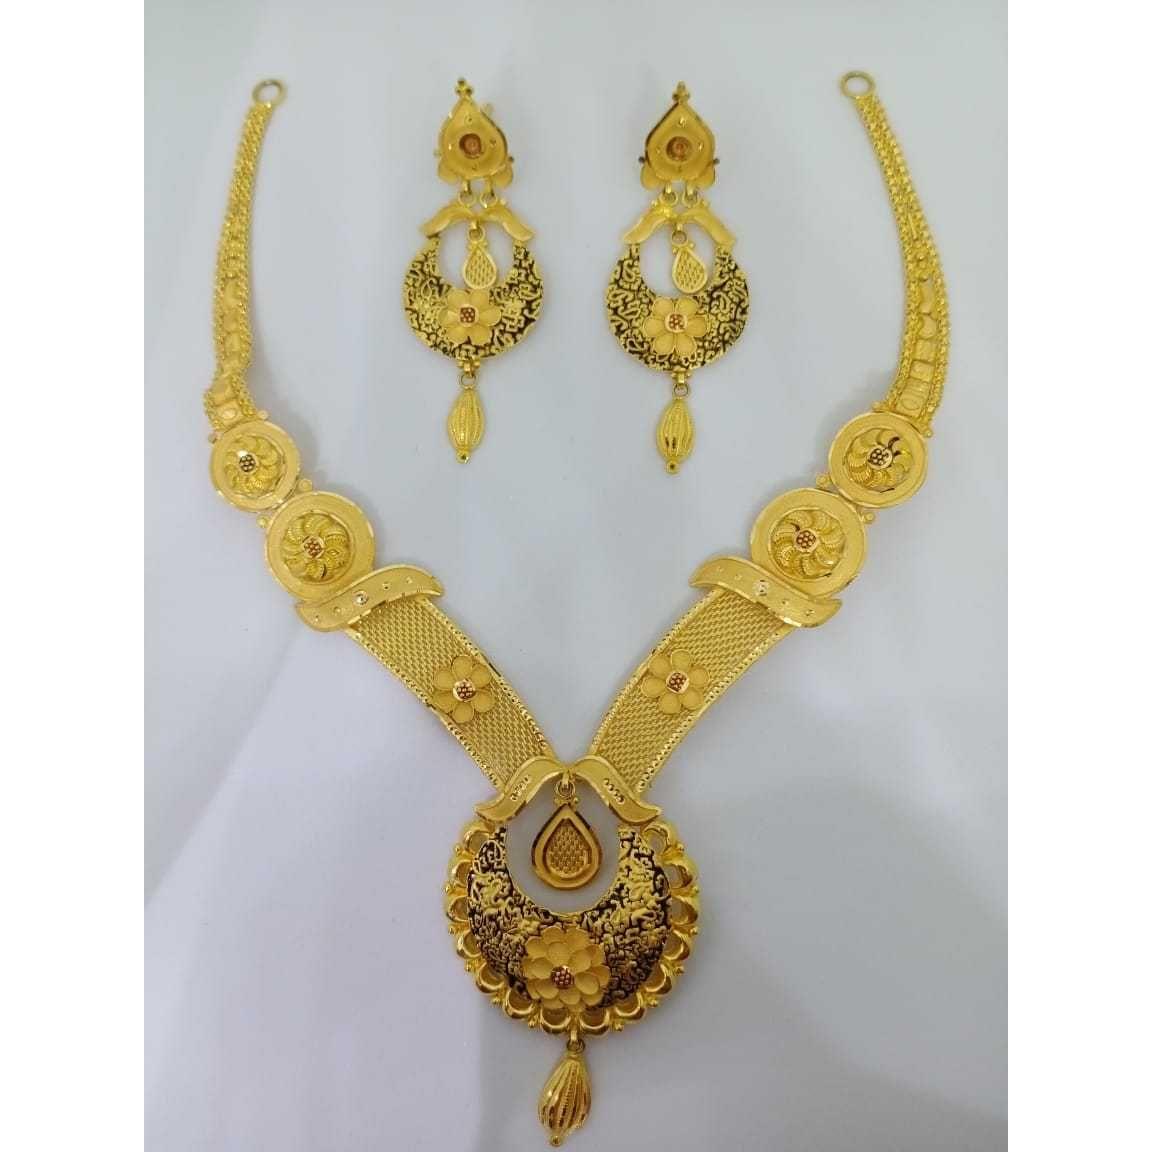 916 gold bridal choker set bj-n10